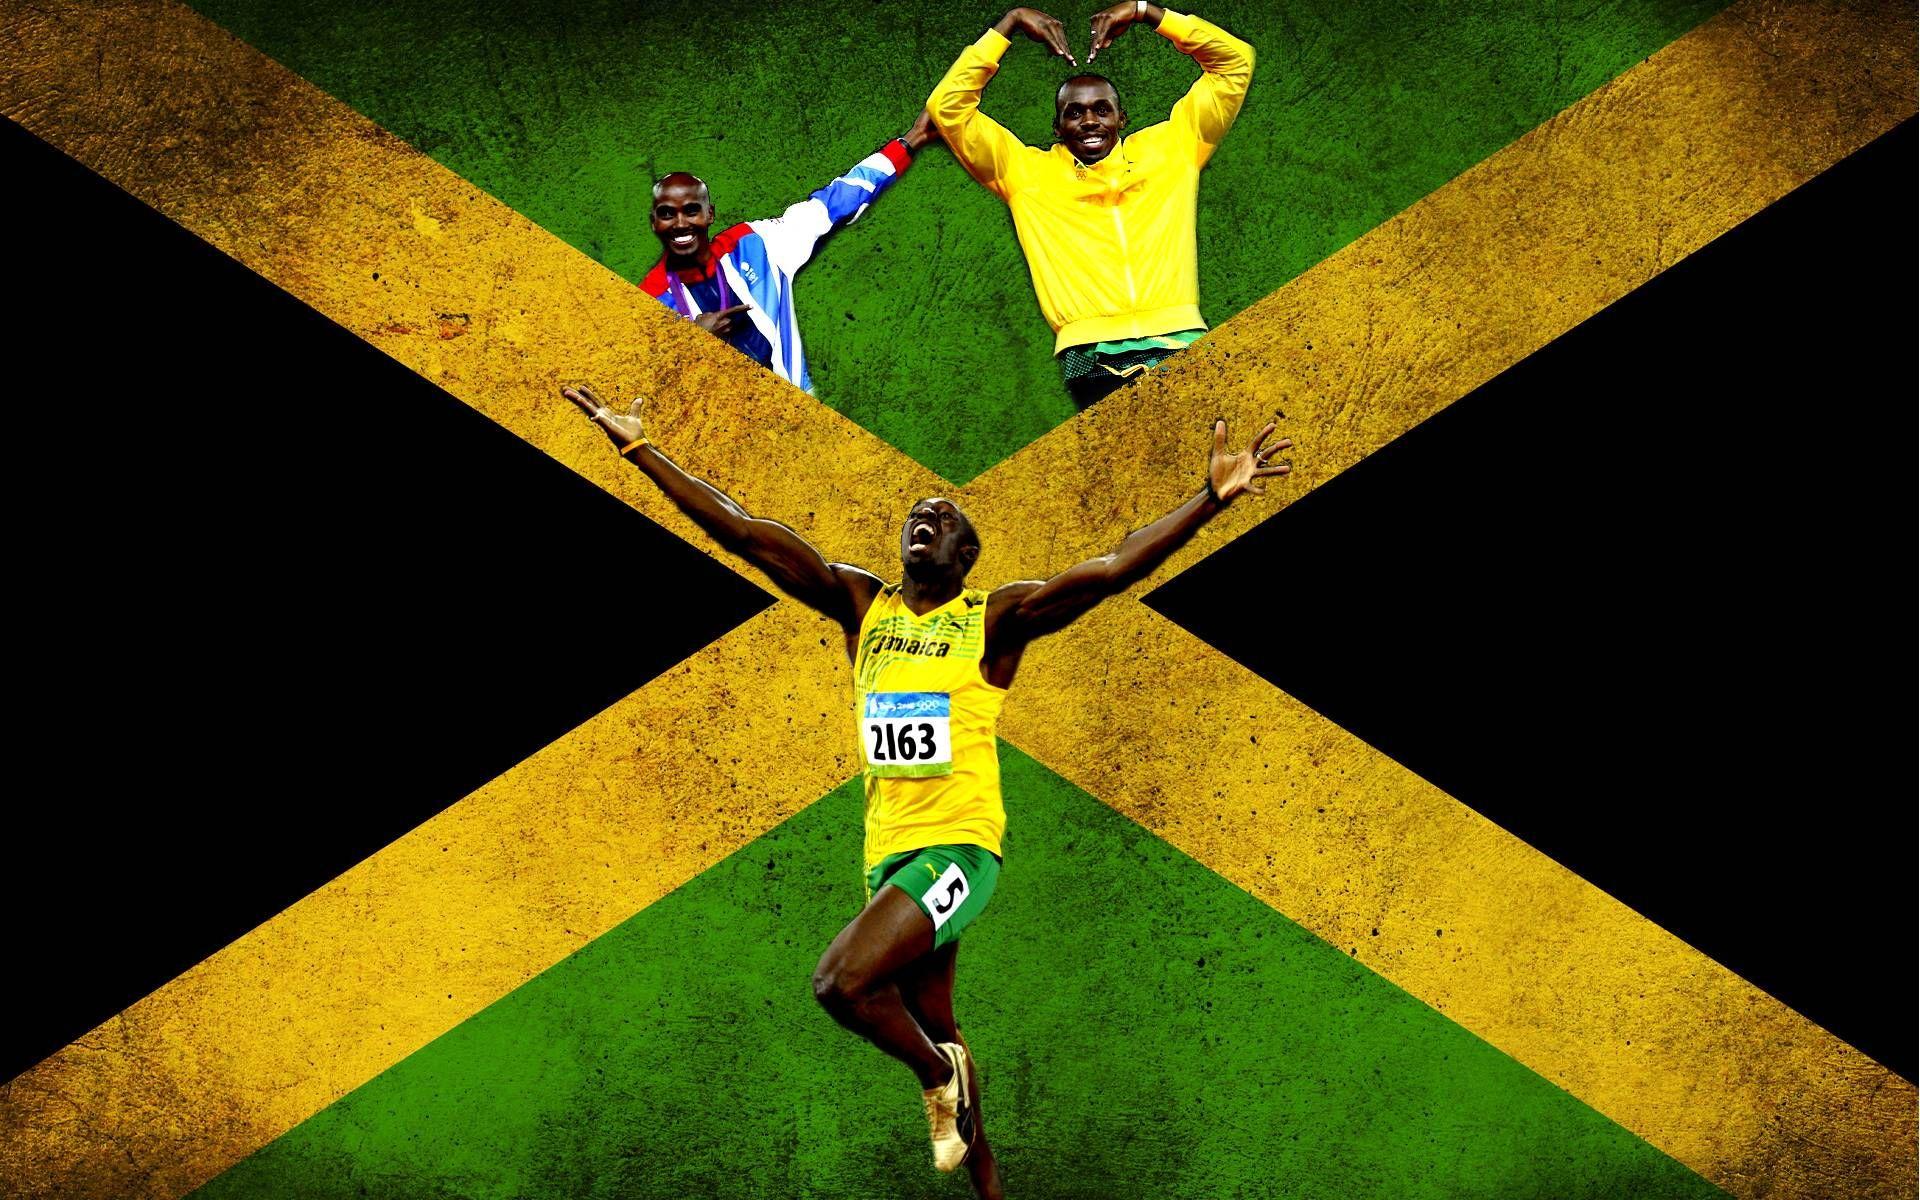 Usain Bolt Puma Wallpaper Free Usain Bolt Images Usain Bolt Sports Flags